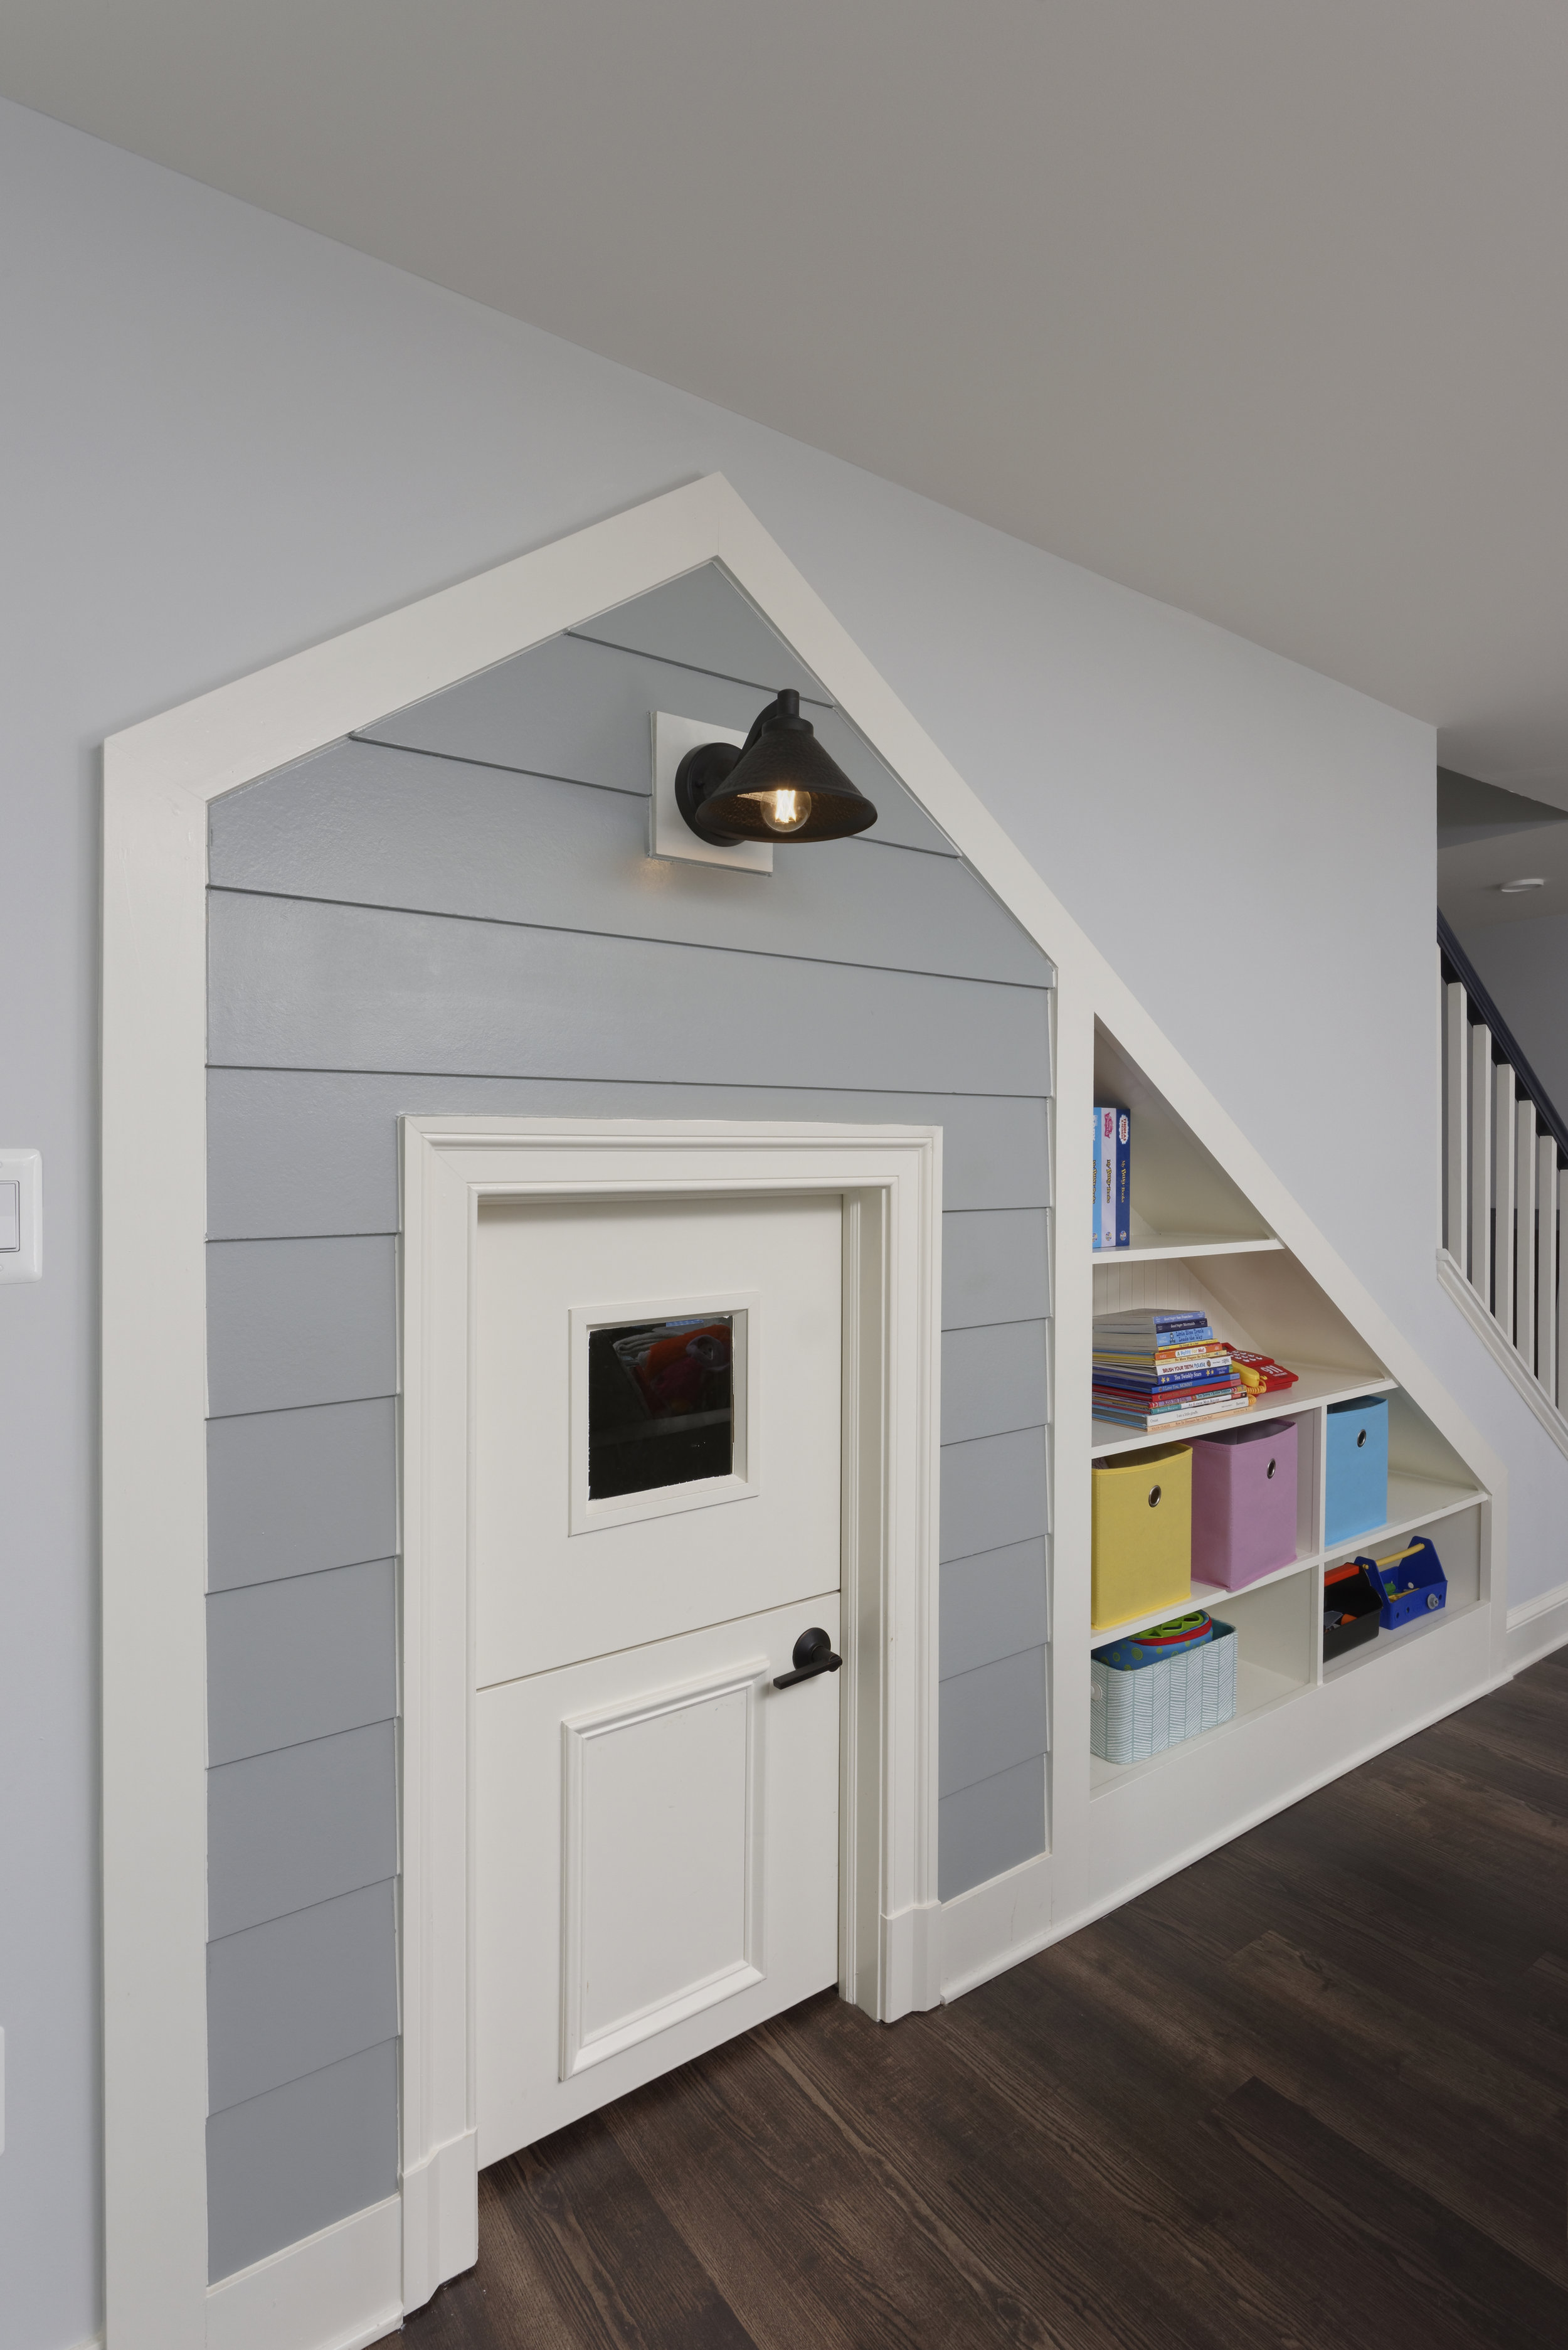 Meltzer High Res-Playroom-Door Closed-D19045-3876.jpg